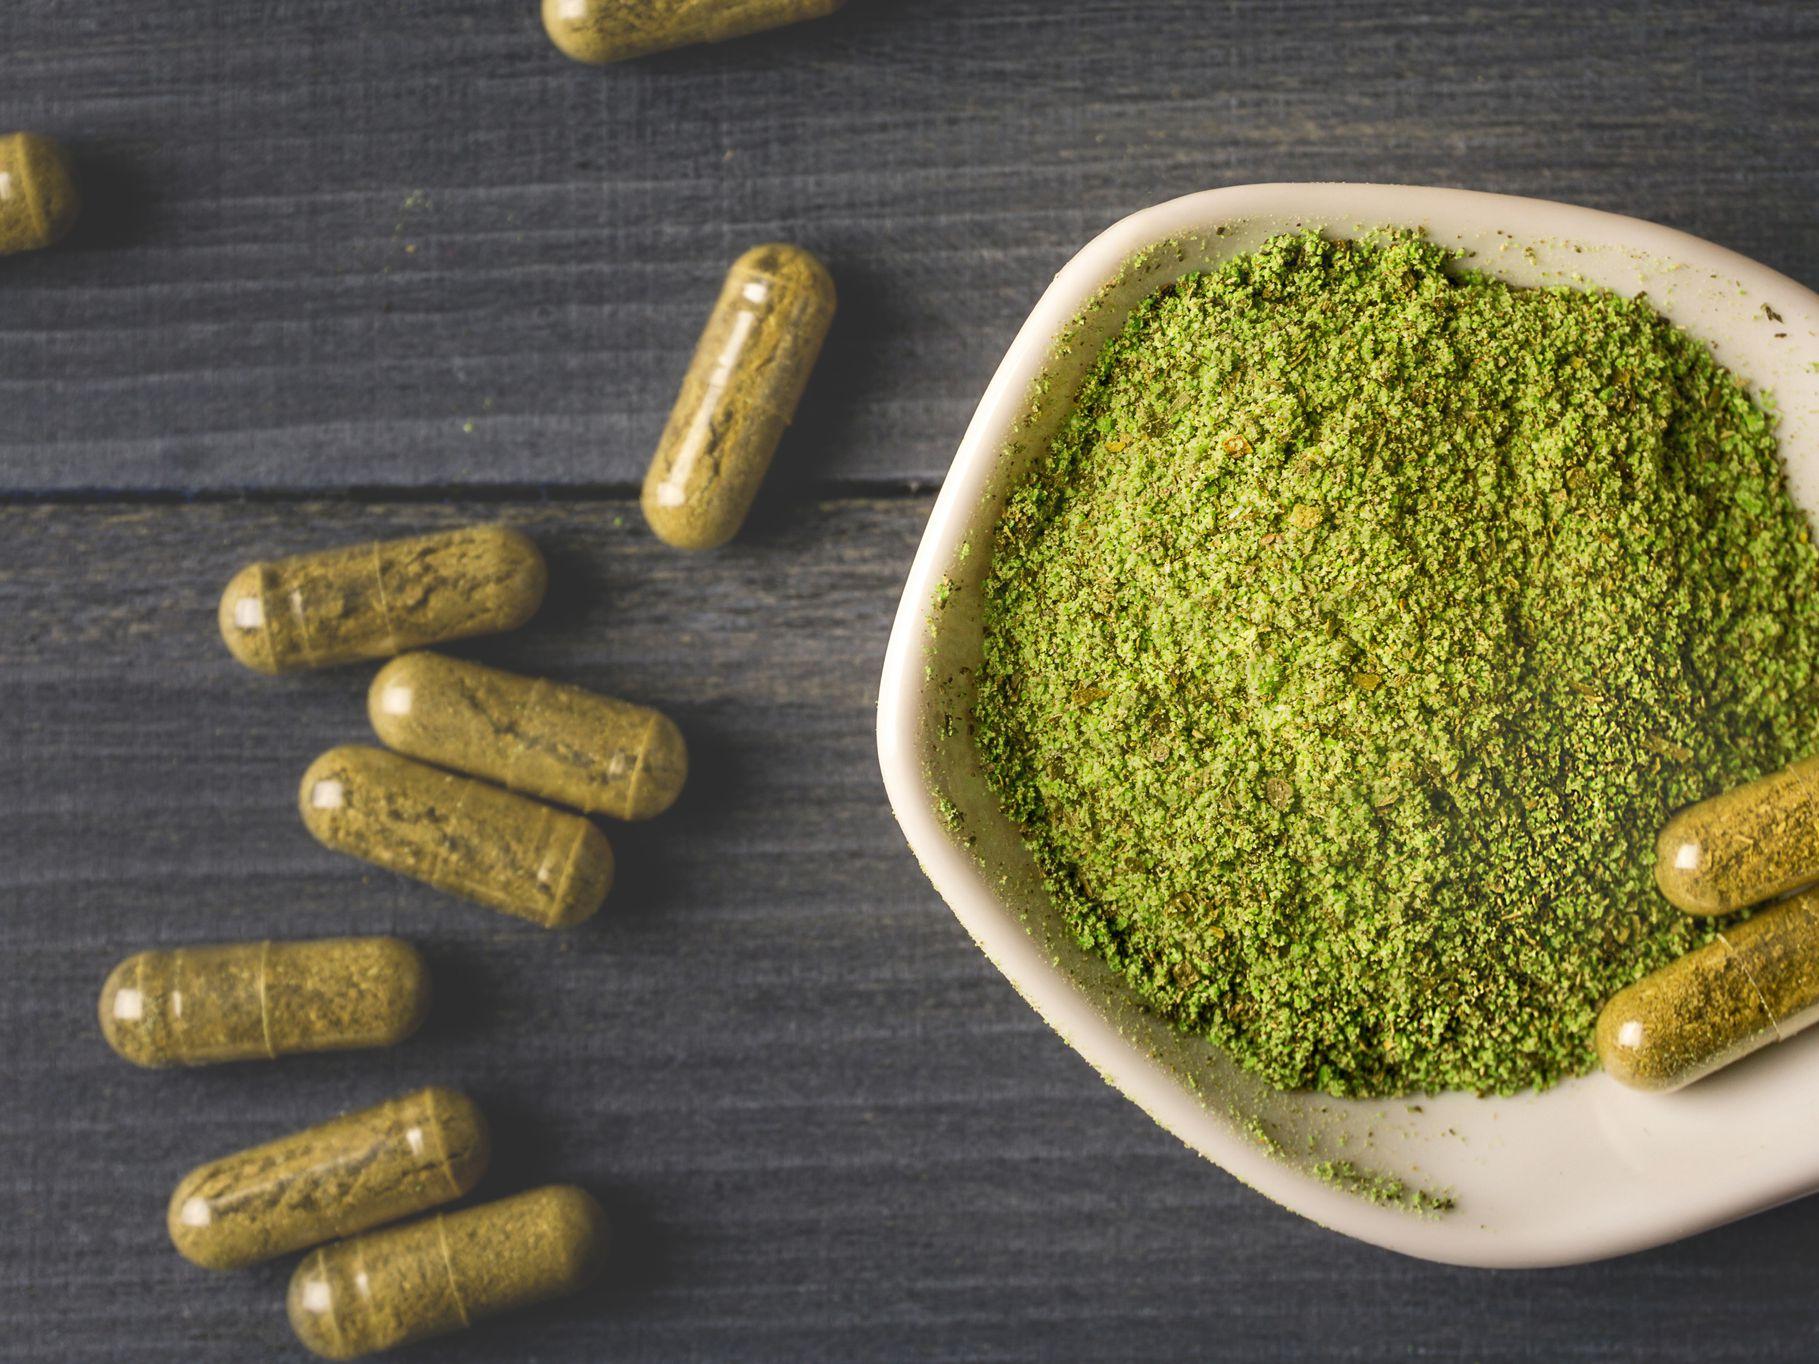 Do maeng da kratom capsules act as painkillers?